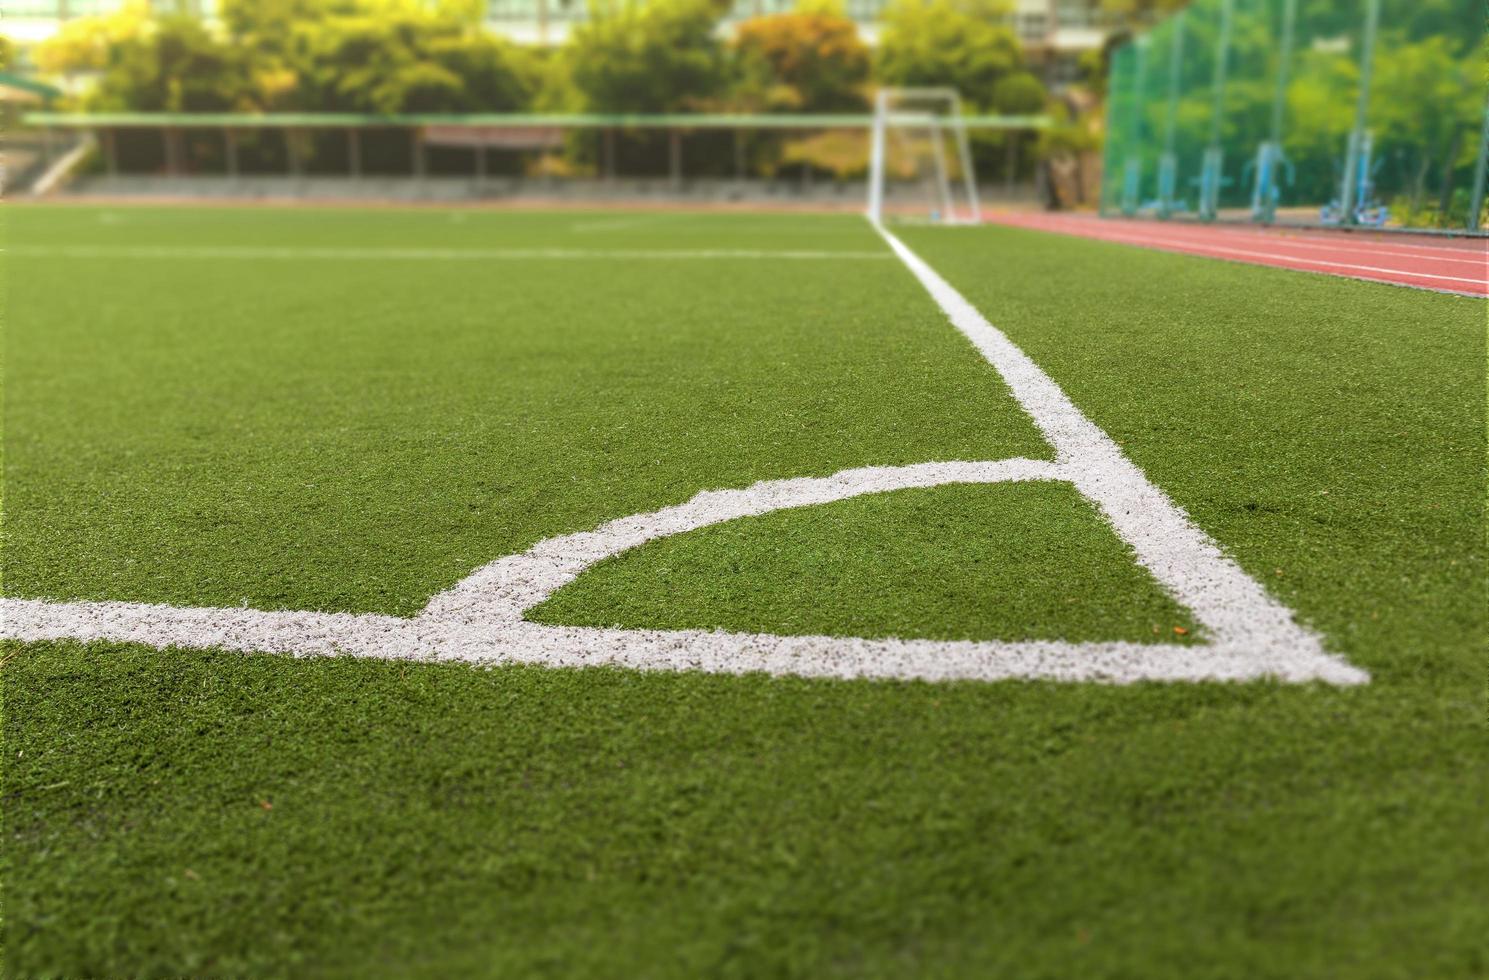 campo de fútbol o fútbol con línea blanca foto